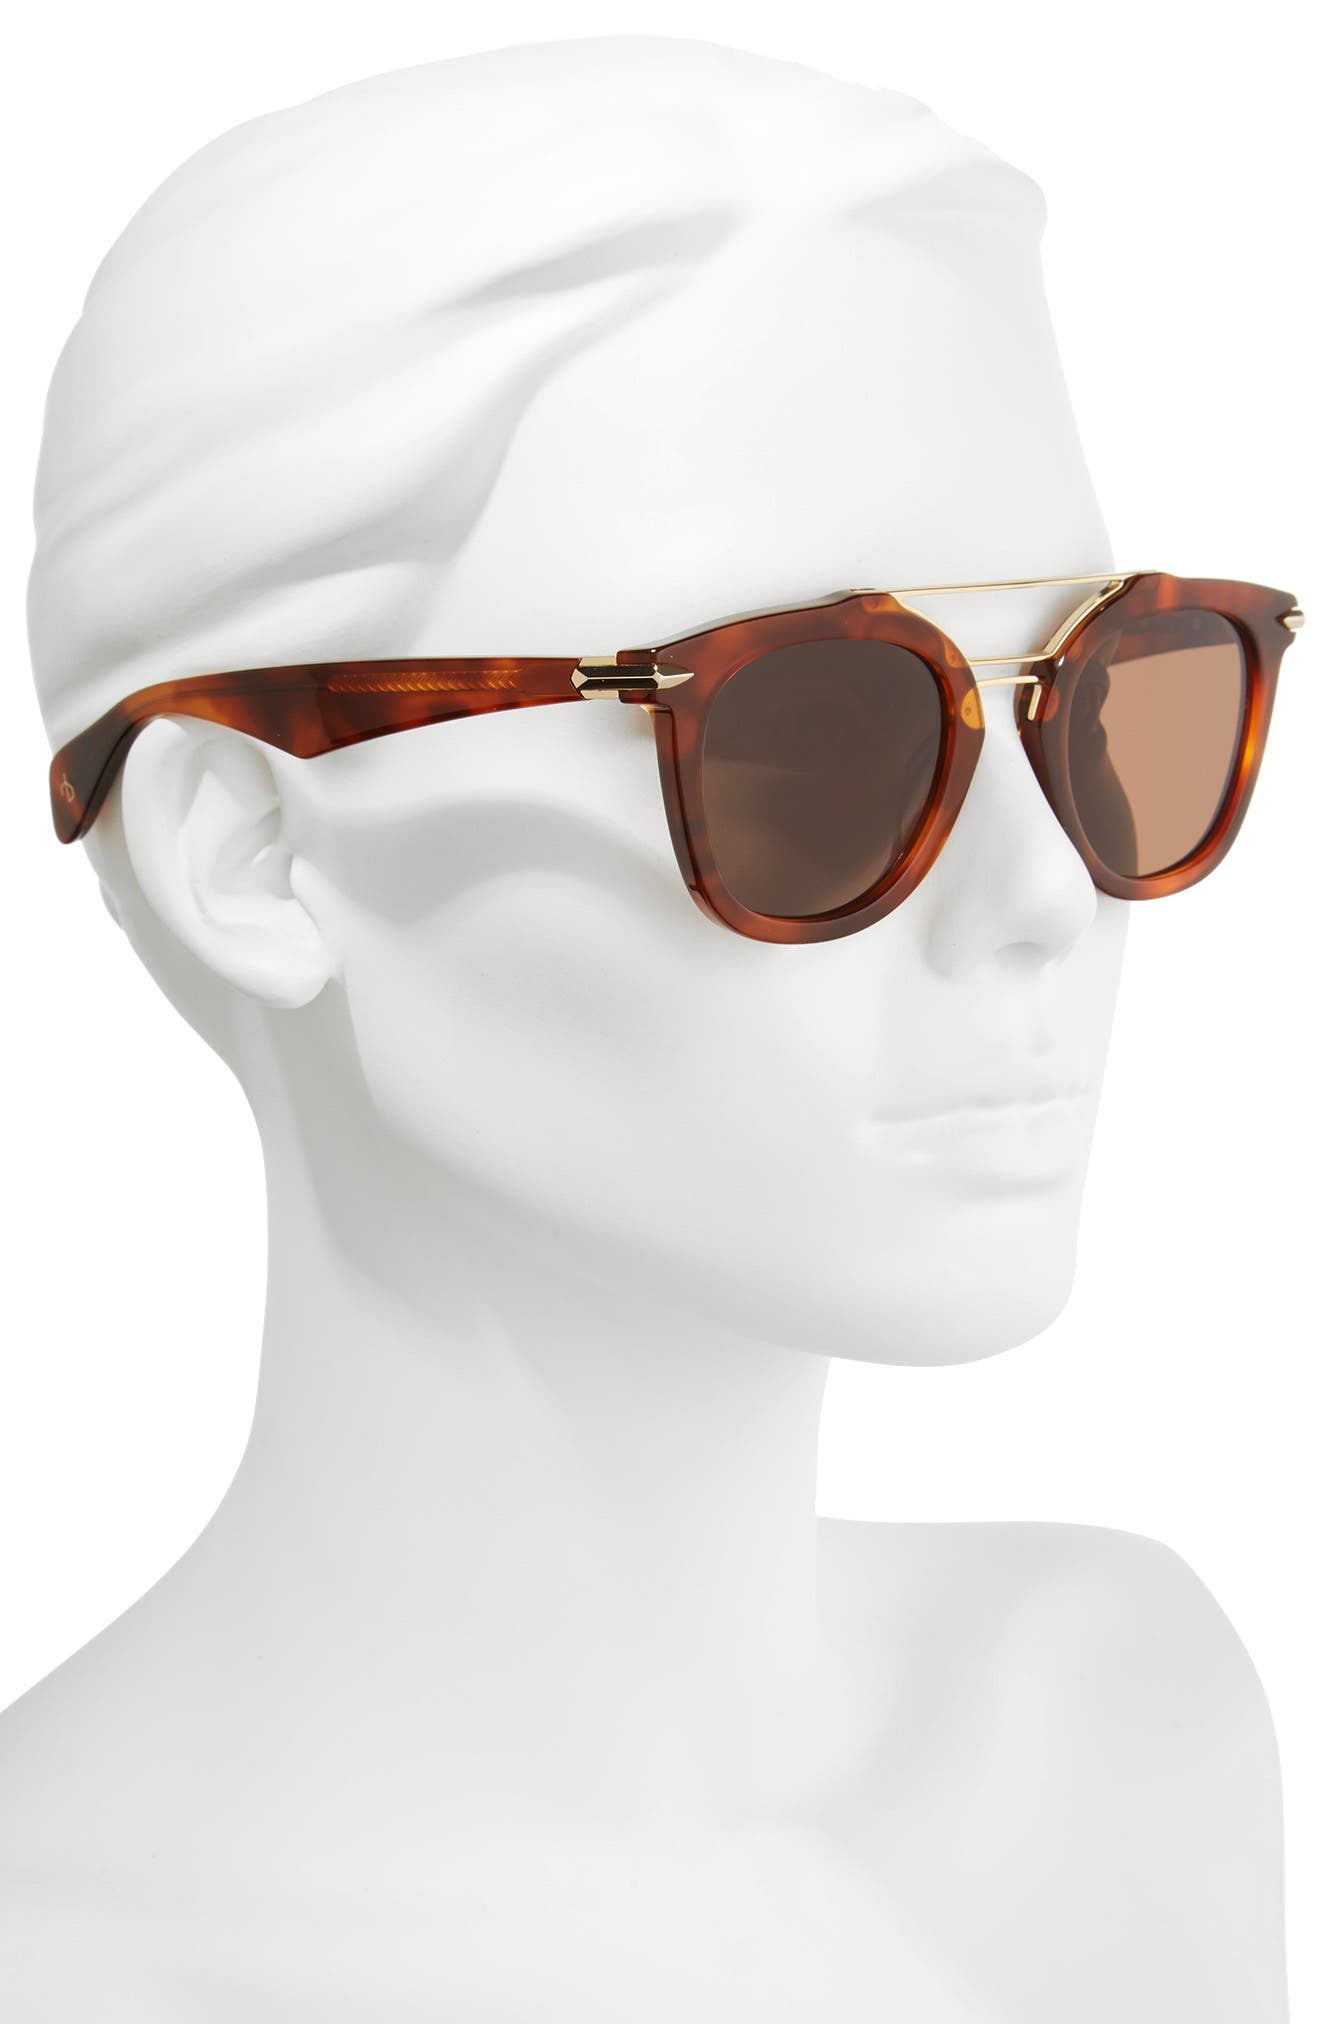 50mm Round Aviator Sunglasses,                             Alternate thumbnail 2, color,                             Havana Honey